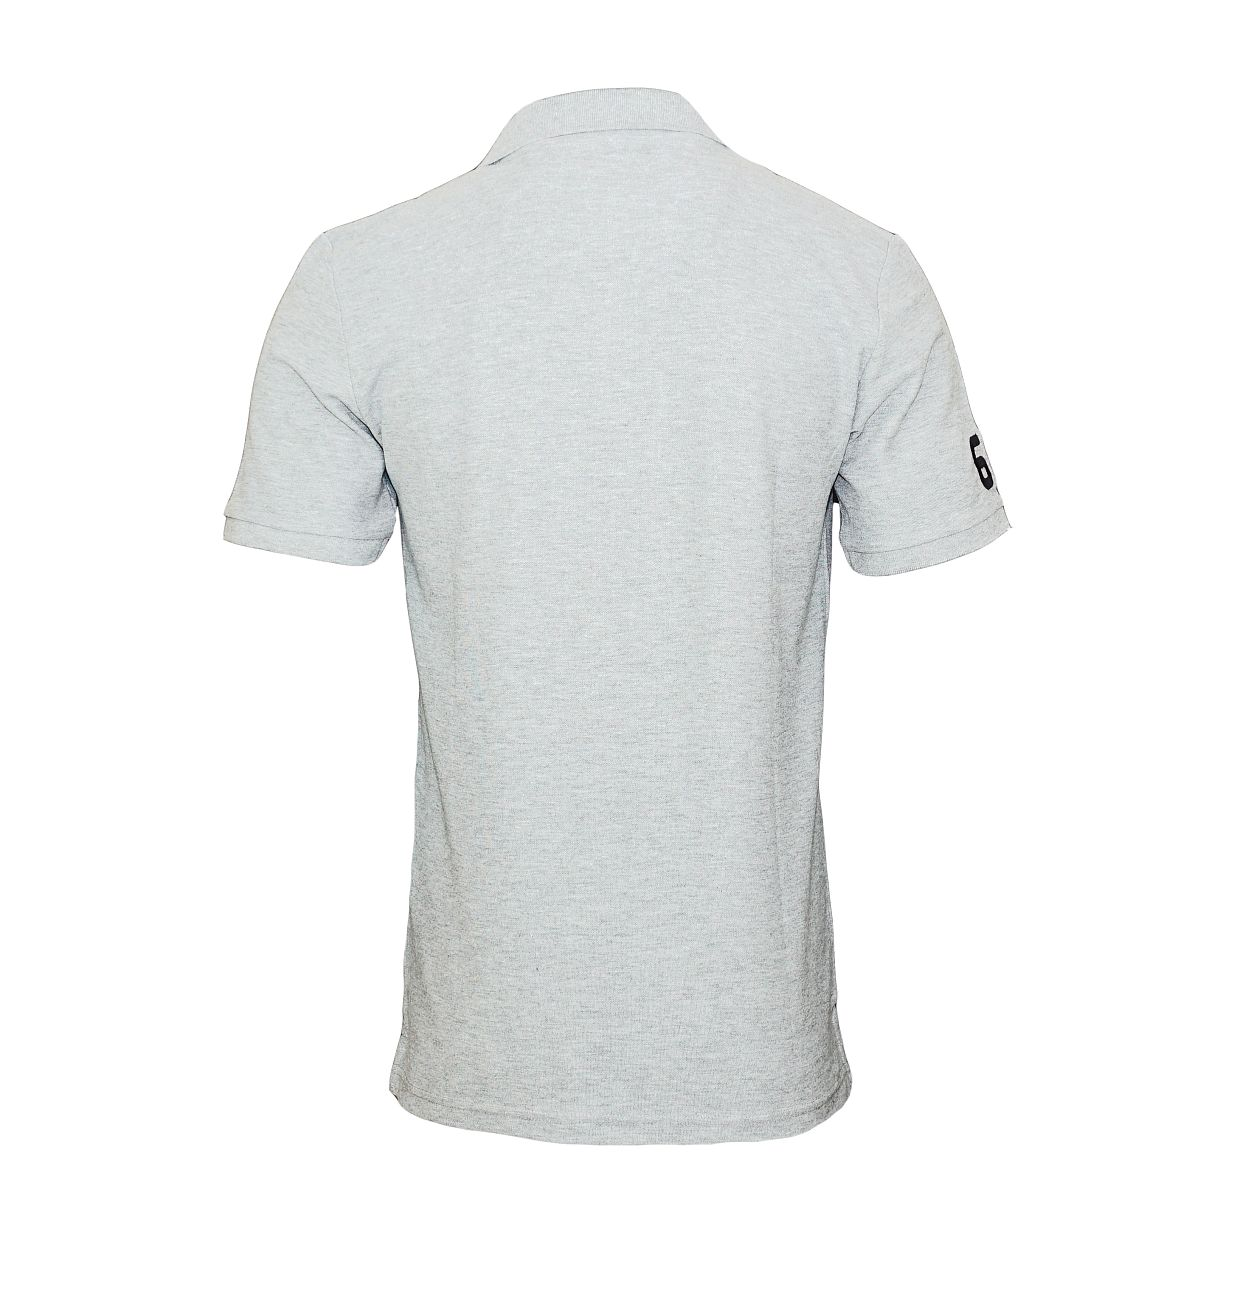 Daniel Hechter T-Shirt Poloshirt Polo 75100 181990 910 grau silver F18-DHP2